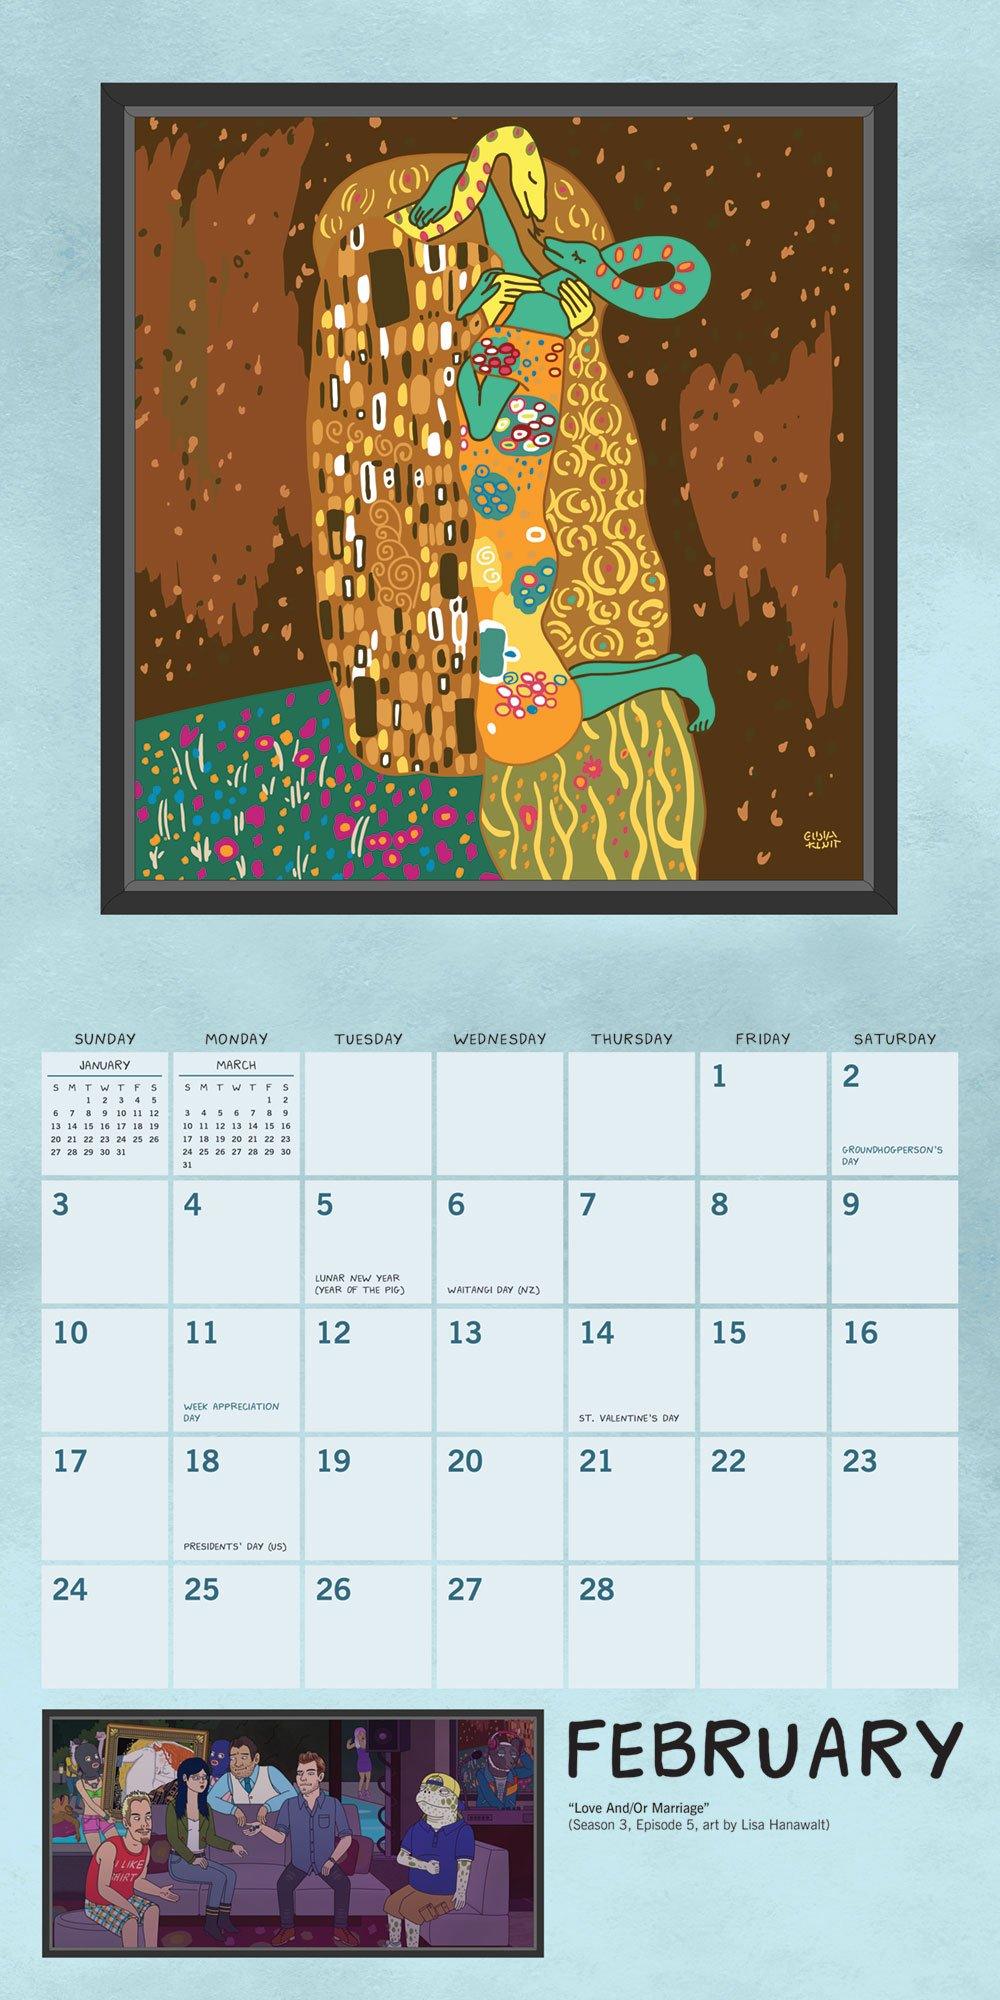 Bojack Horseman 2019 Wall Calendar The Art Of The Art Bojack